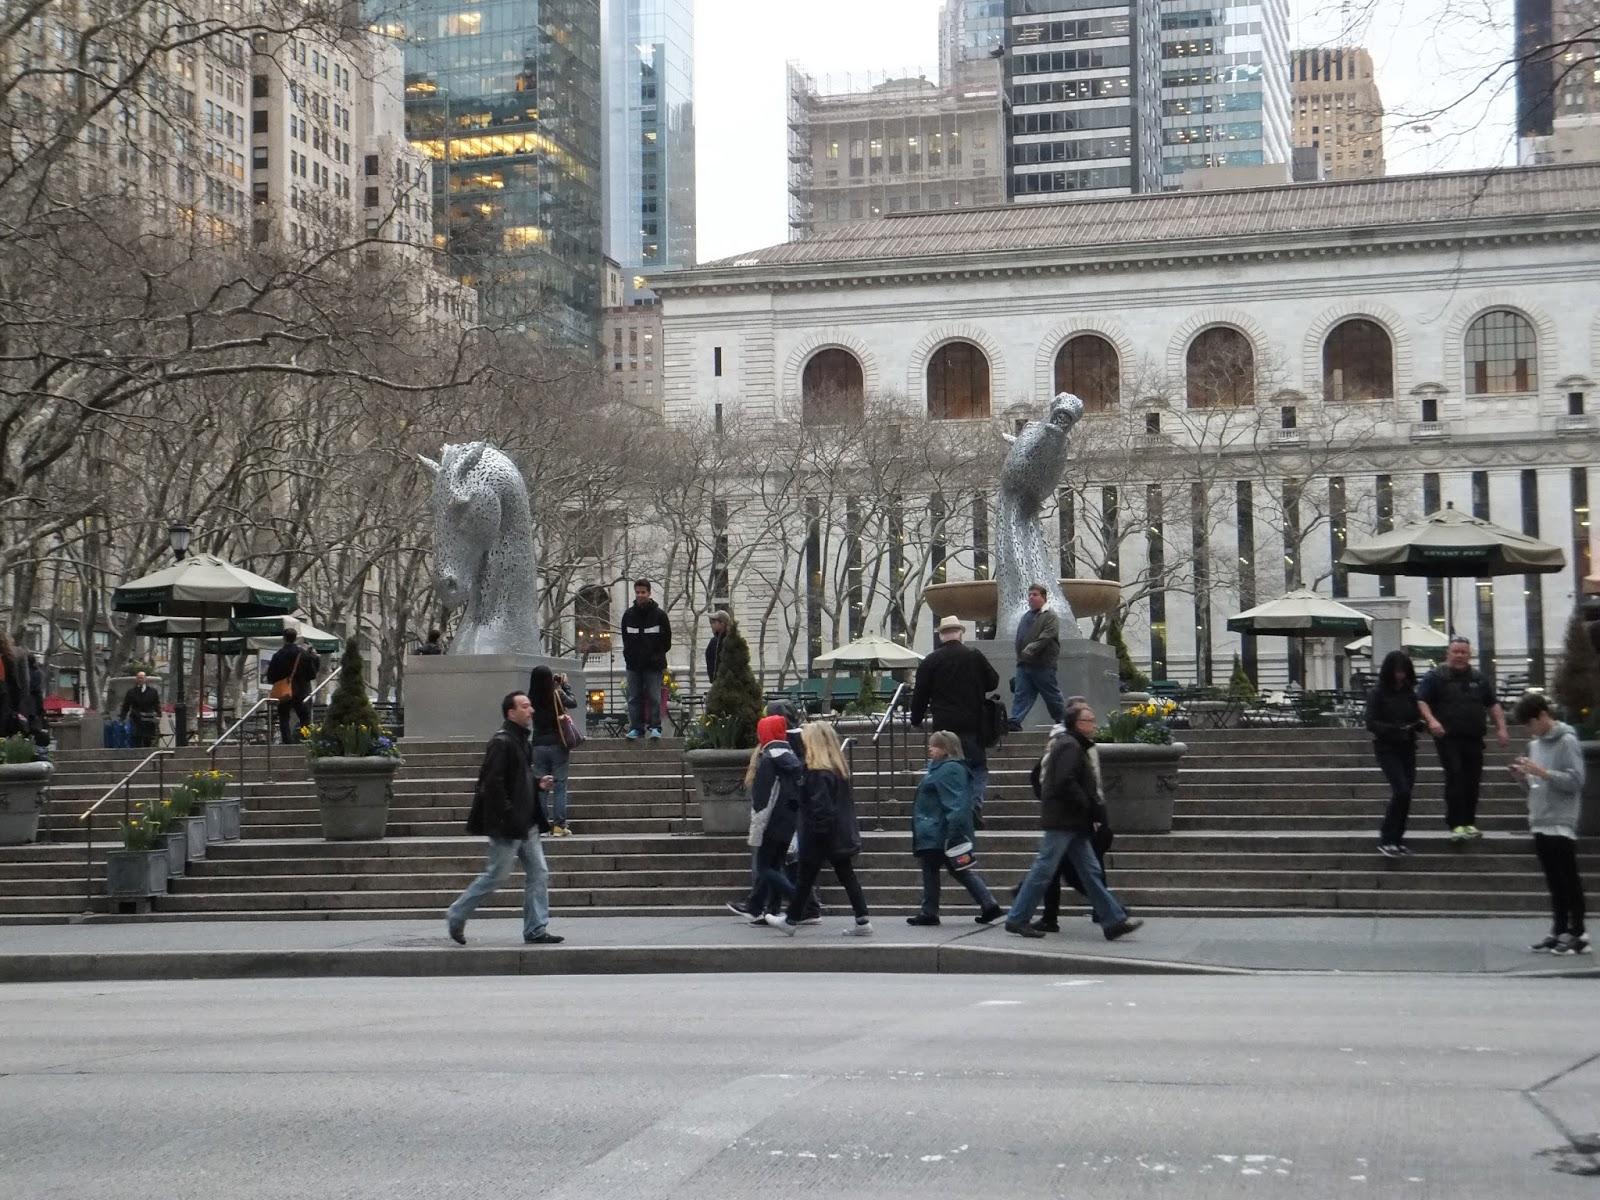 New York Pubic Library, Bryant Park, New York, Elisa N, Blog de Viajes, Lifestyle, Travel